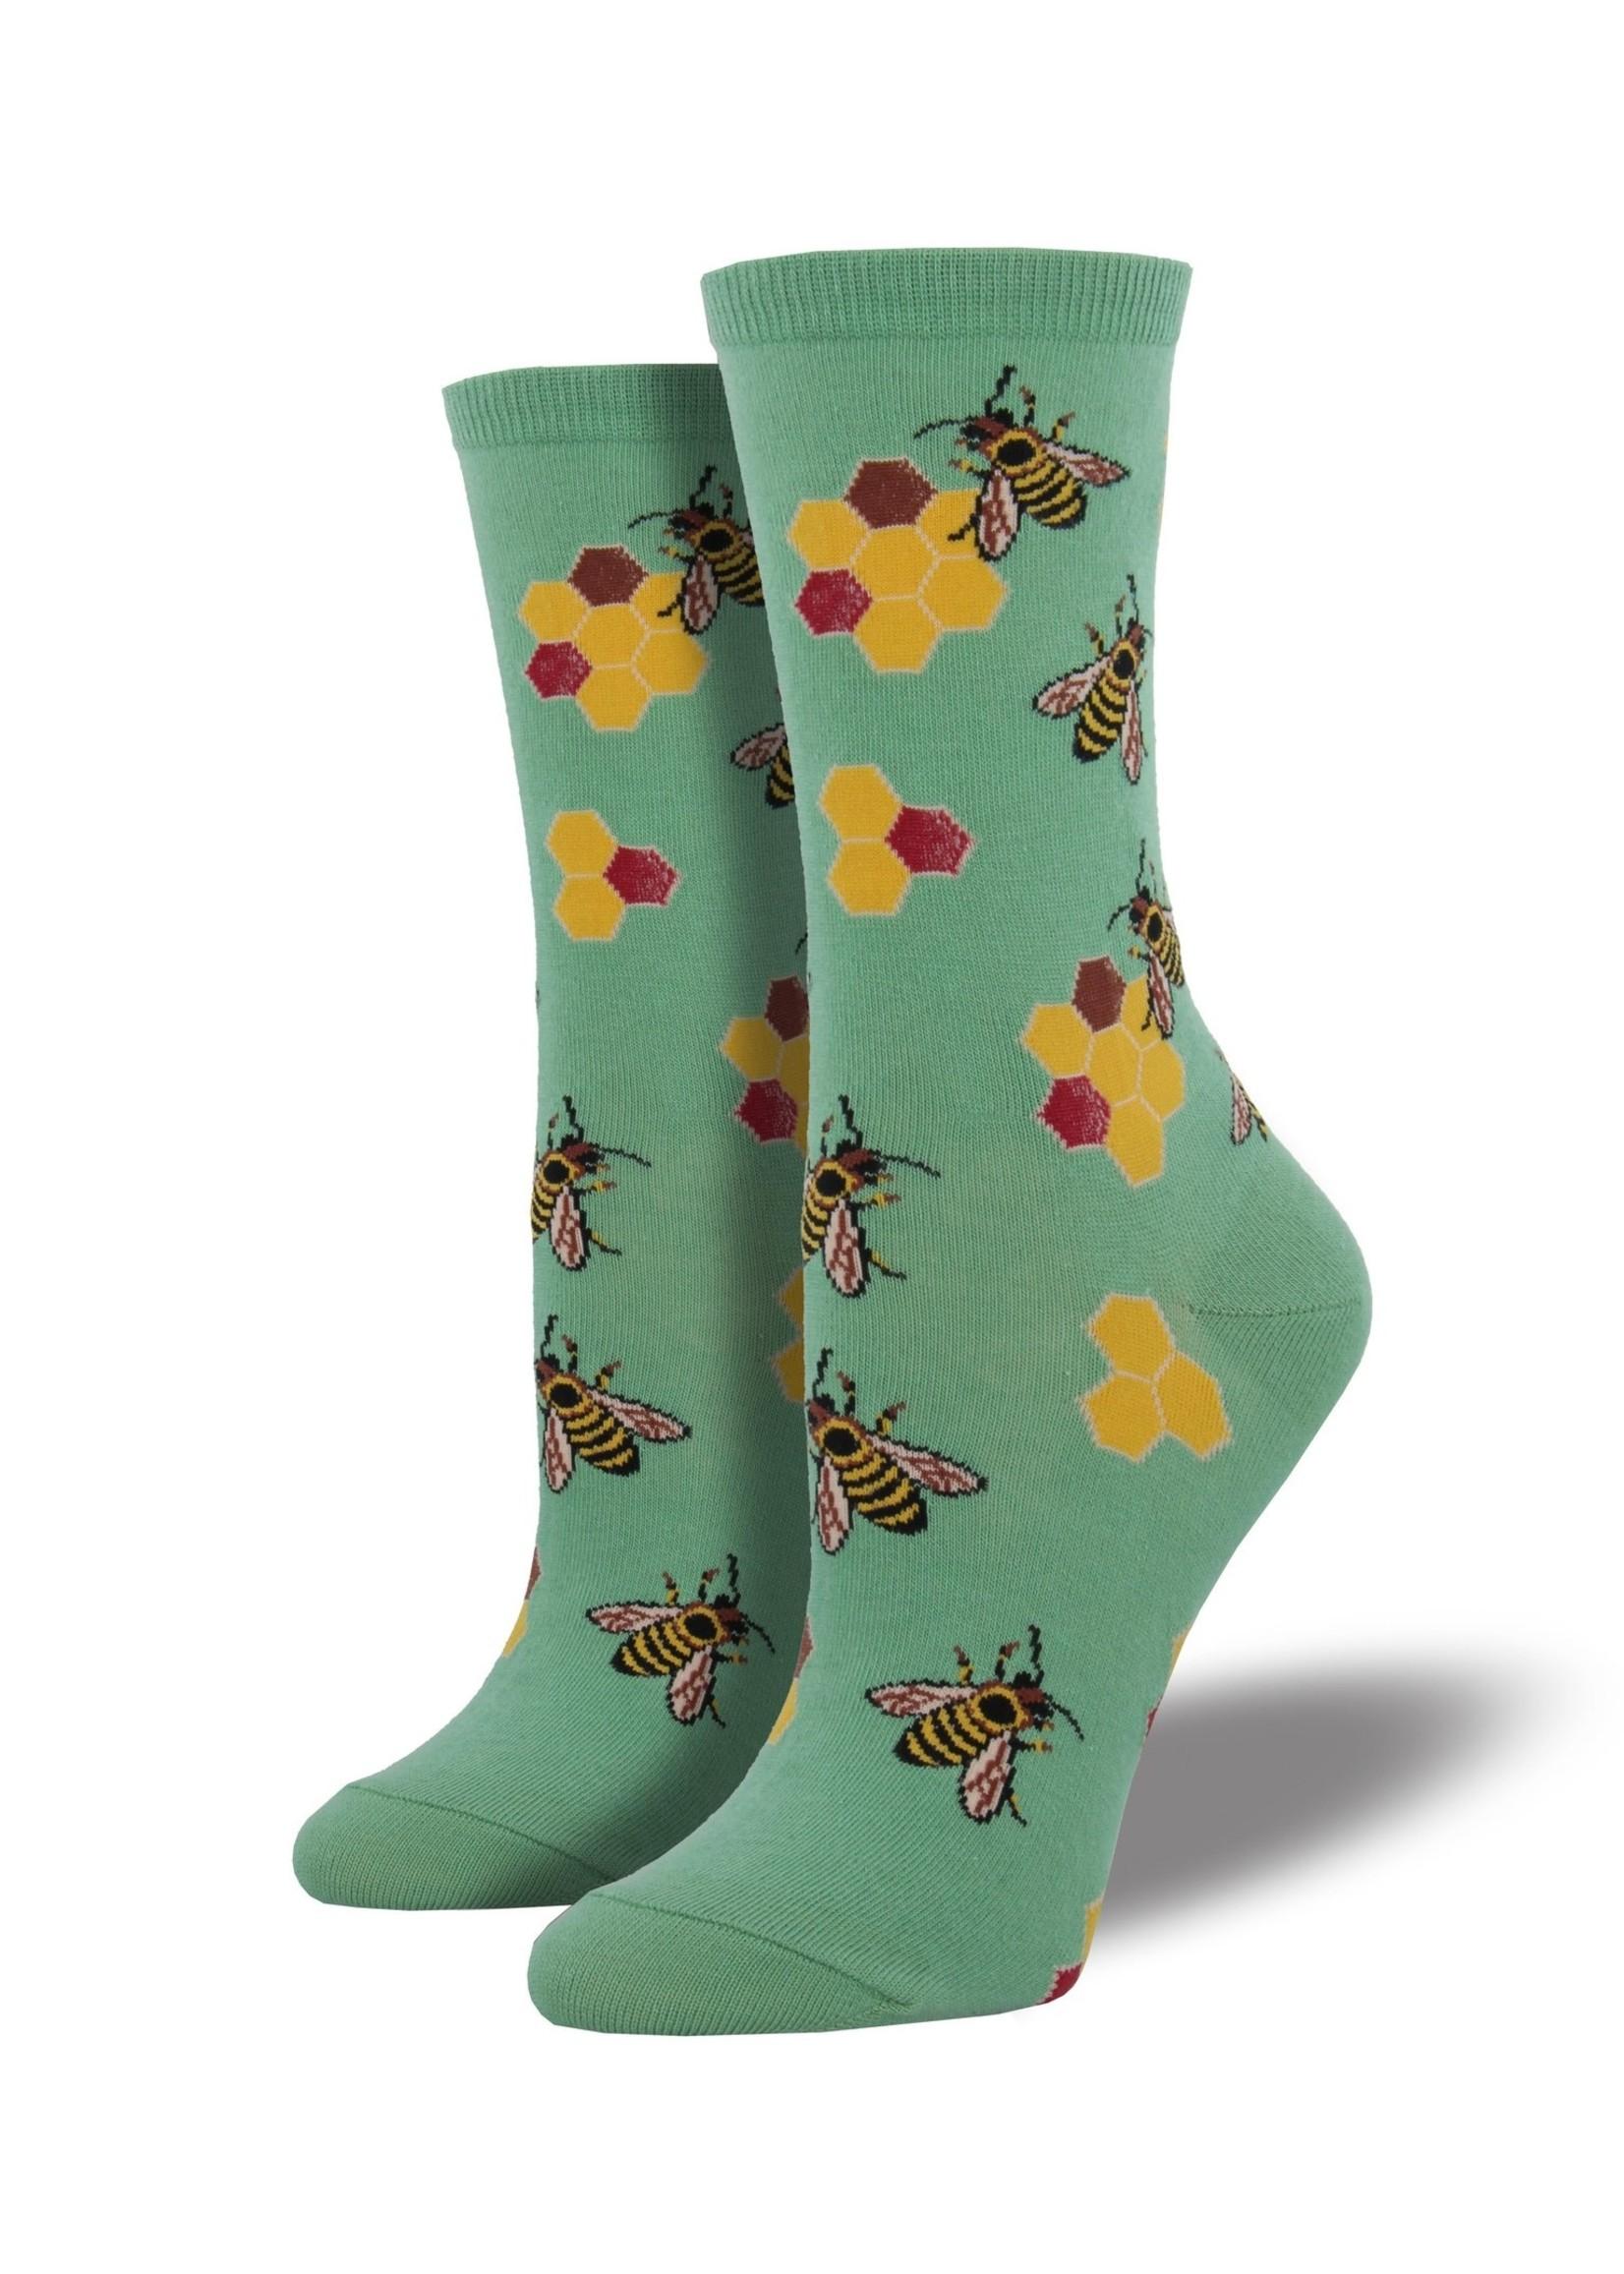 Socksmith Canada Inc WOMEN'S BUSY BEES SOCKS